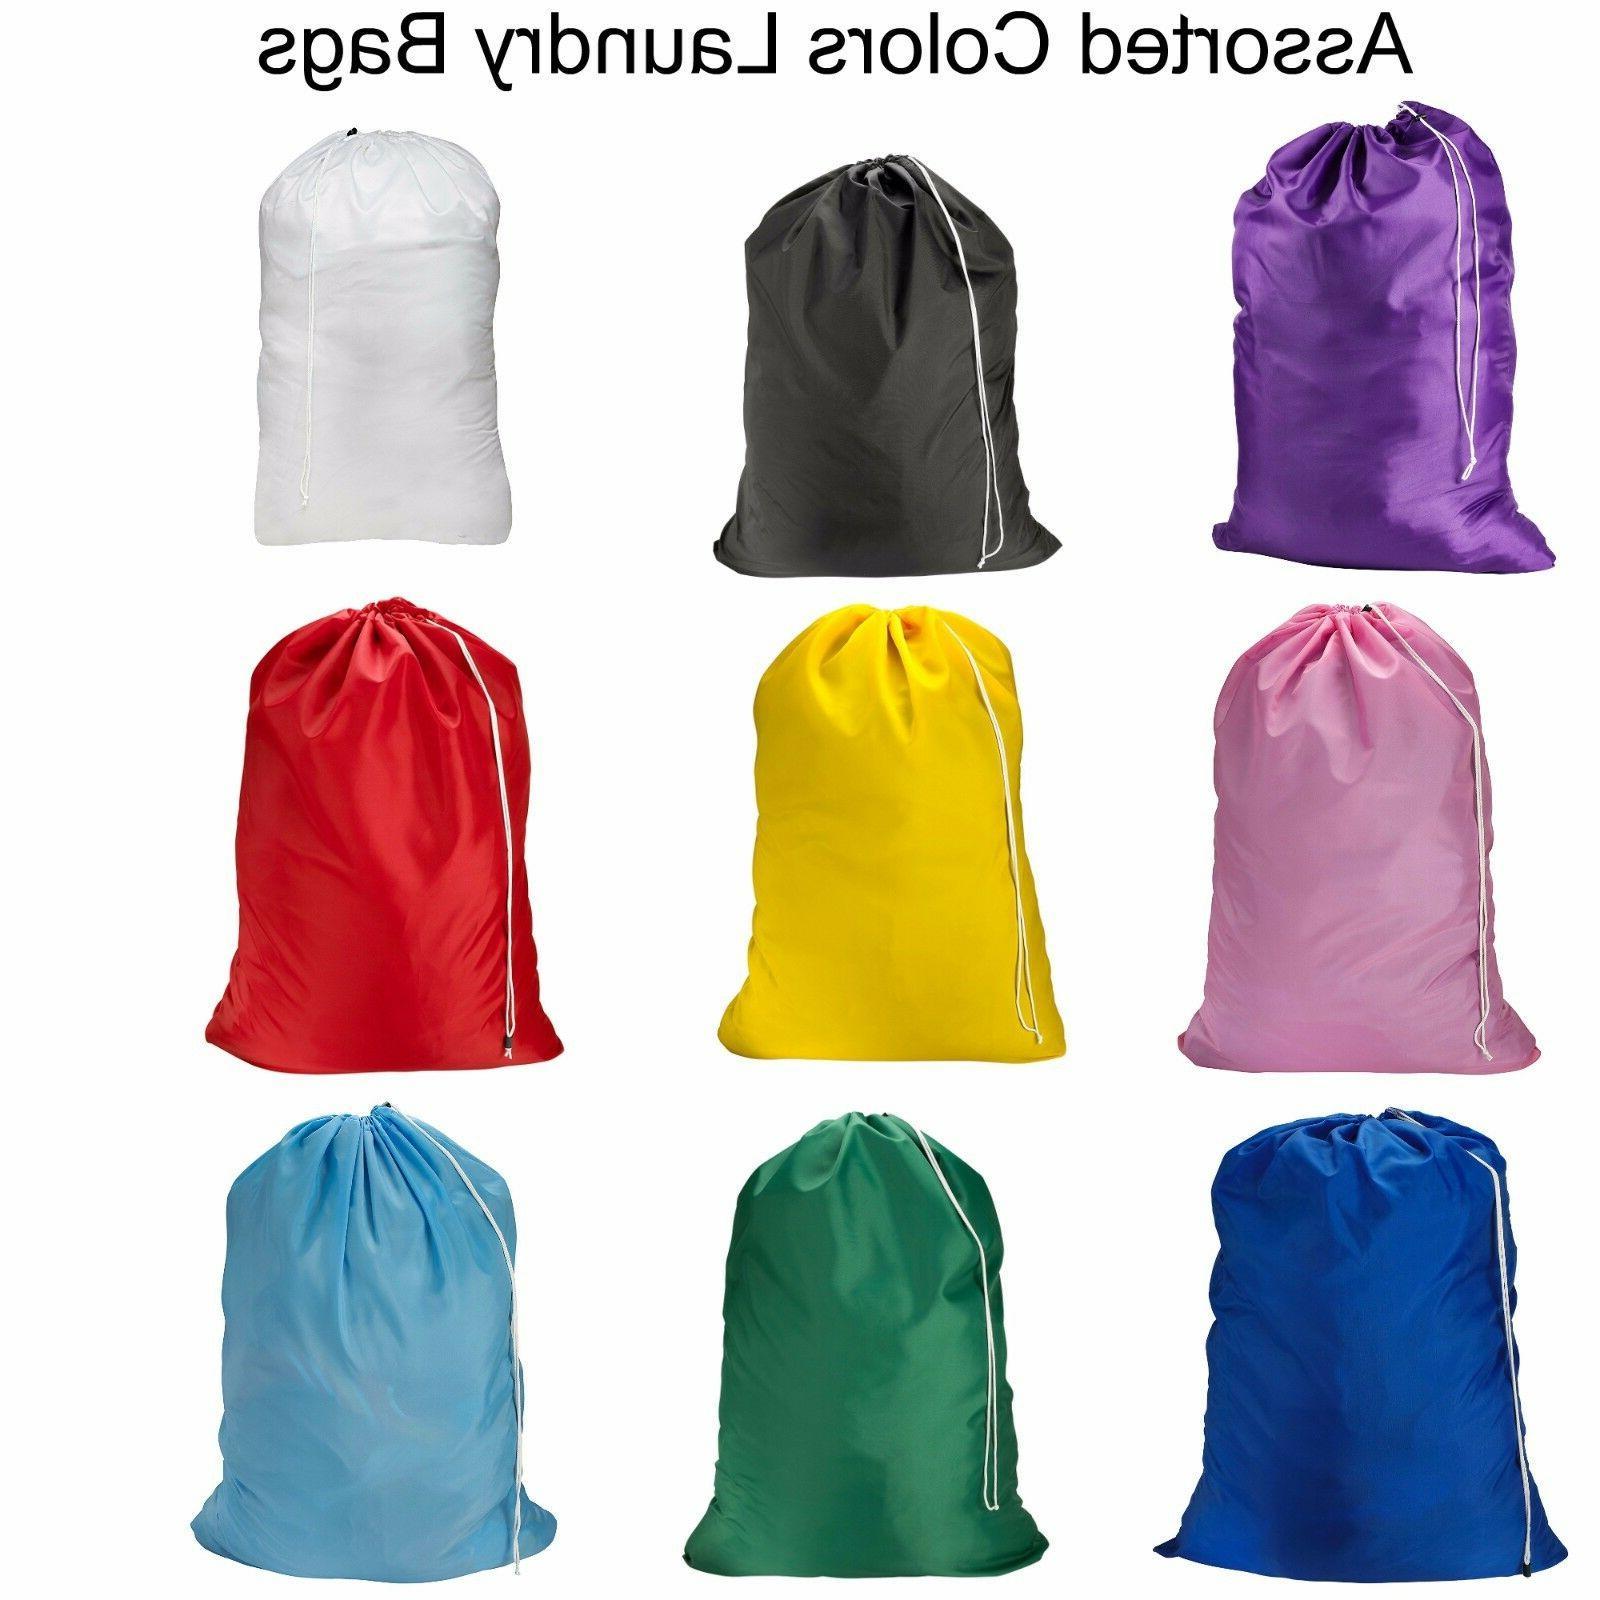 1 2 3 pack laundry bag heavy